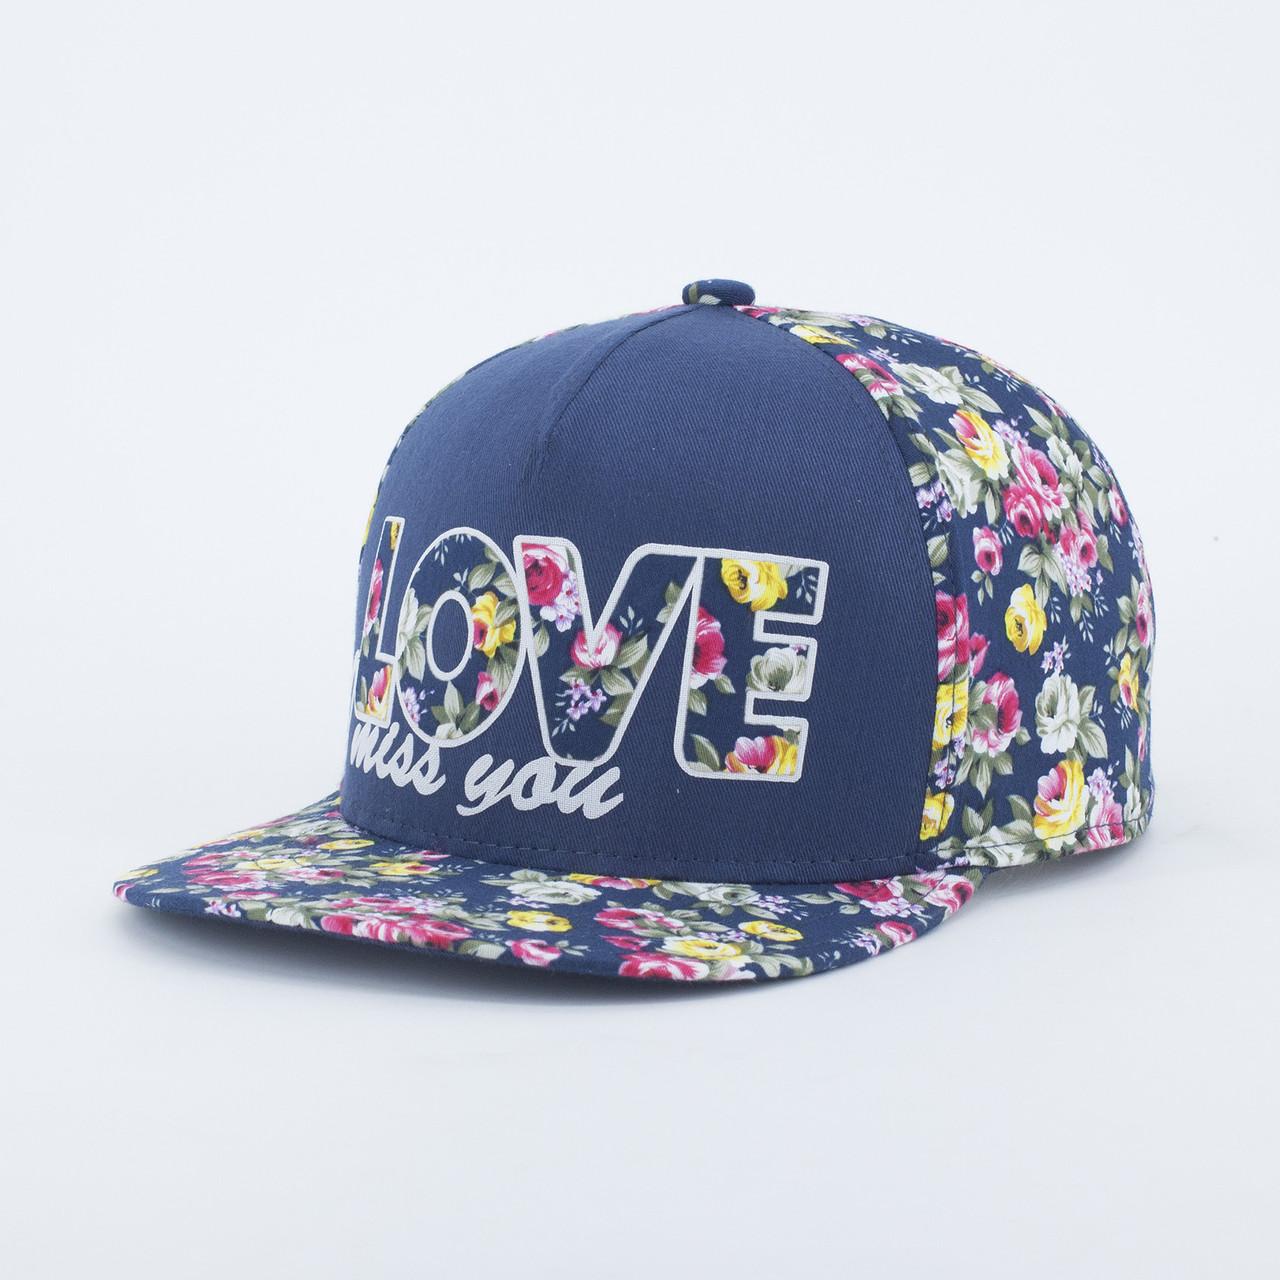 Детская кепка бейсболка для девочки INAL love XS / 51-52 RU Синий 175051